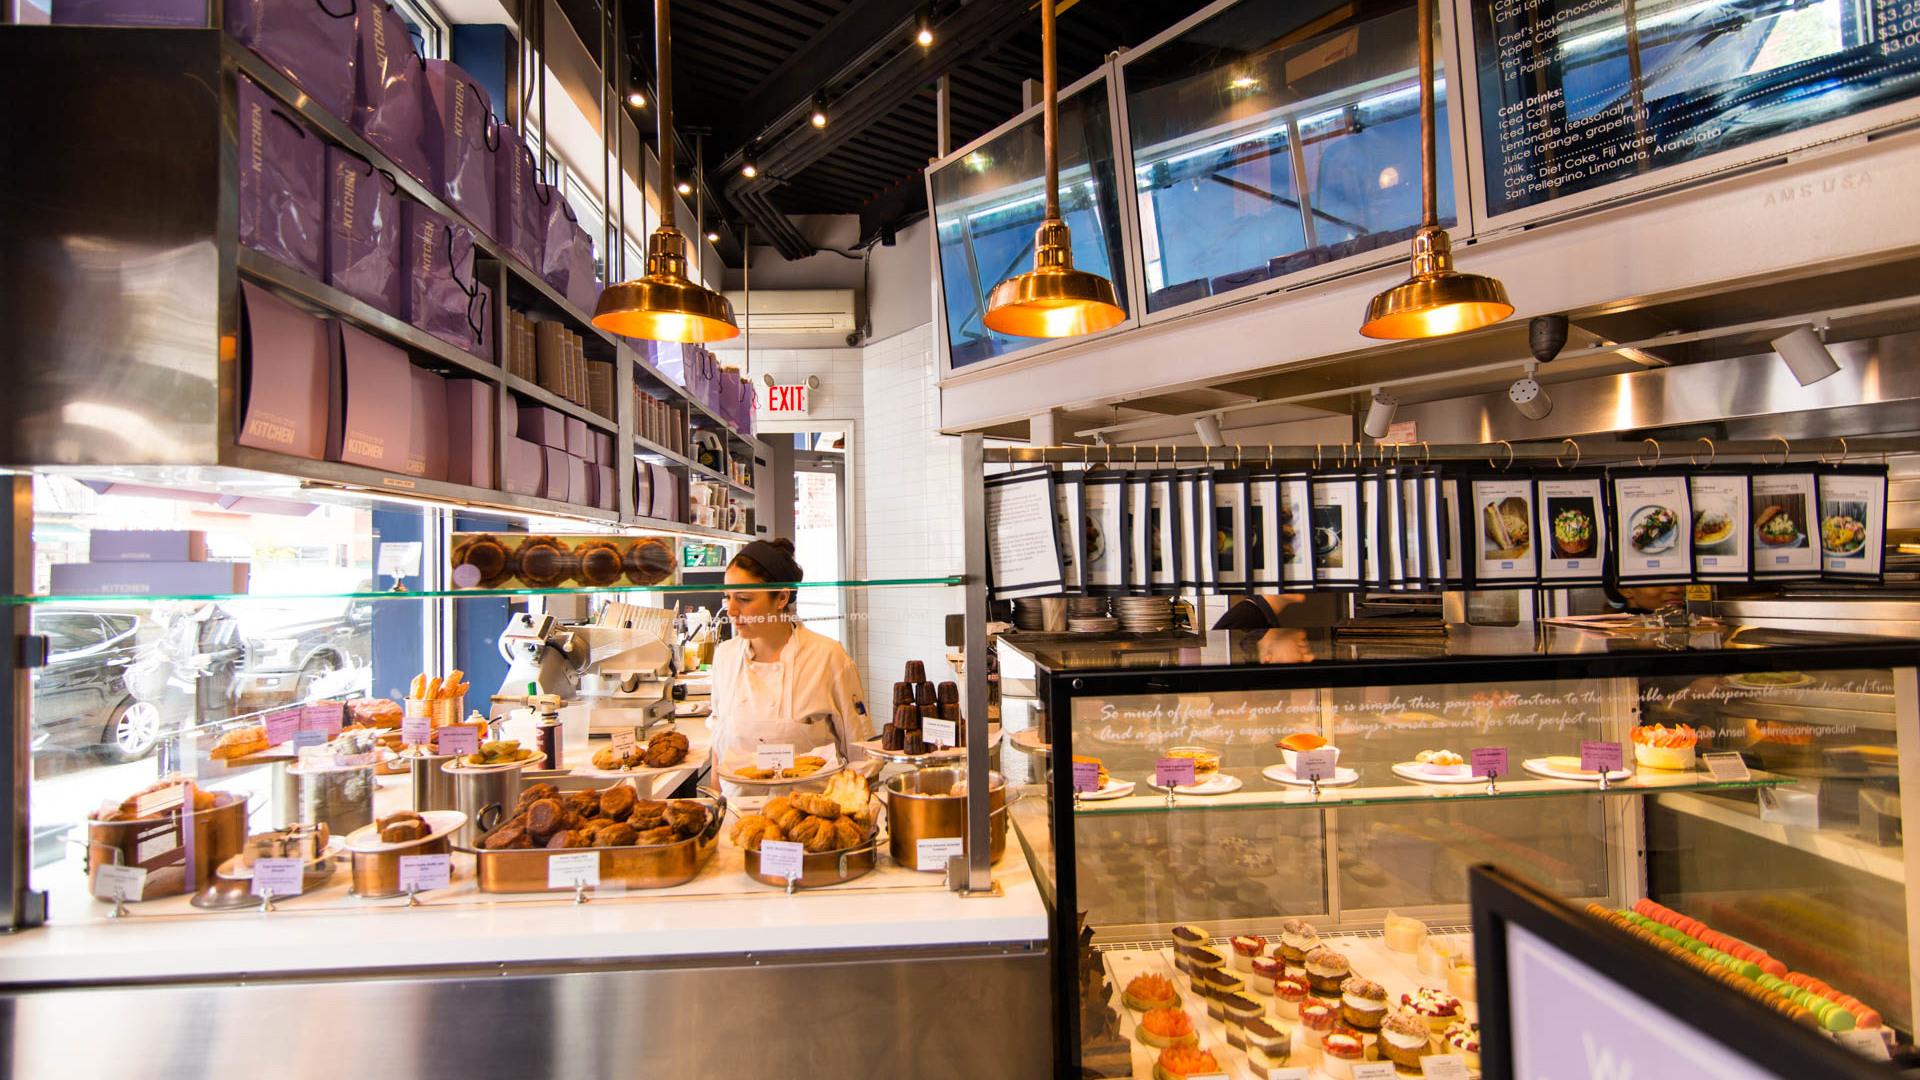 dominique ansel kitchen 2 - Dominique Ansel Kitchen